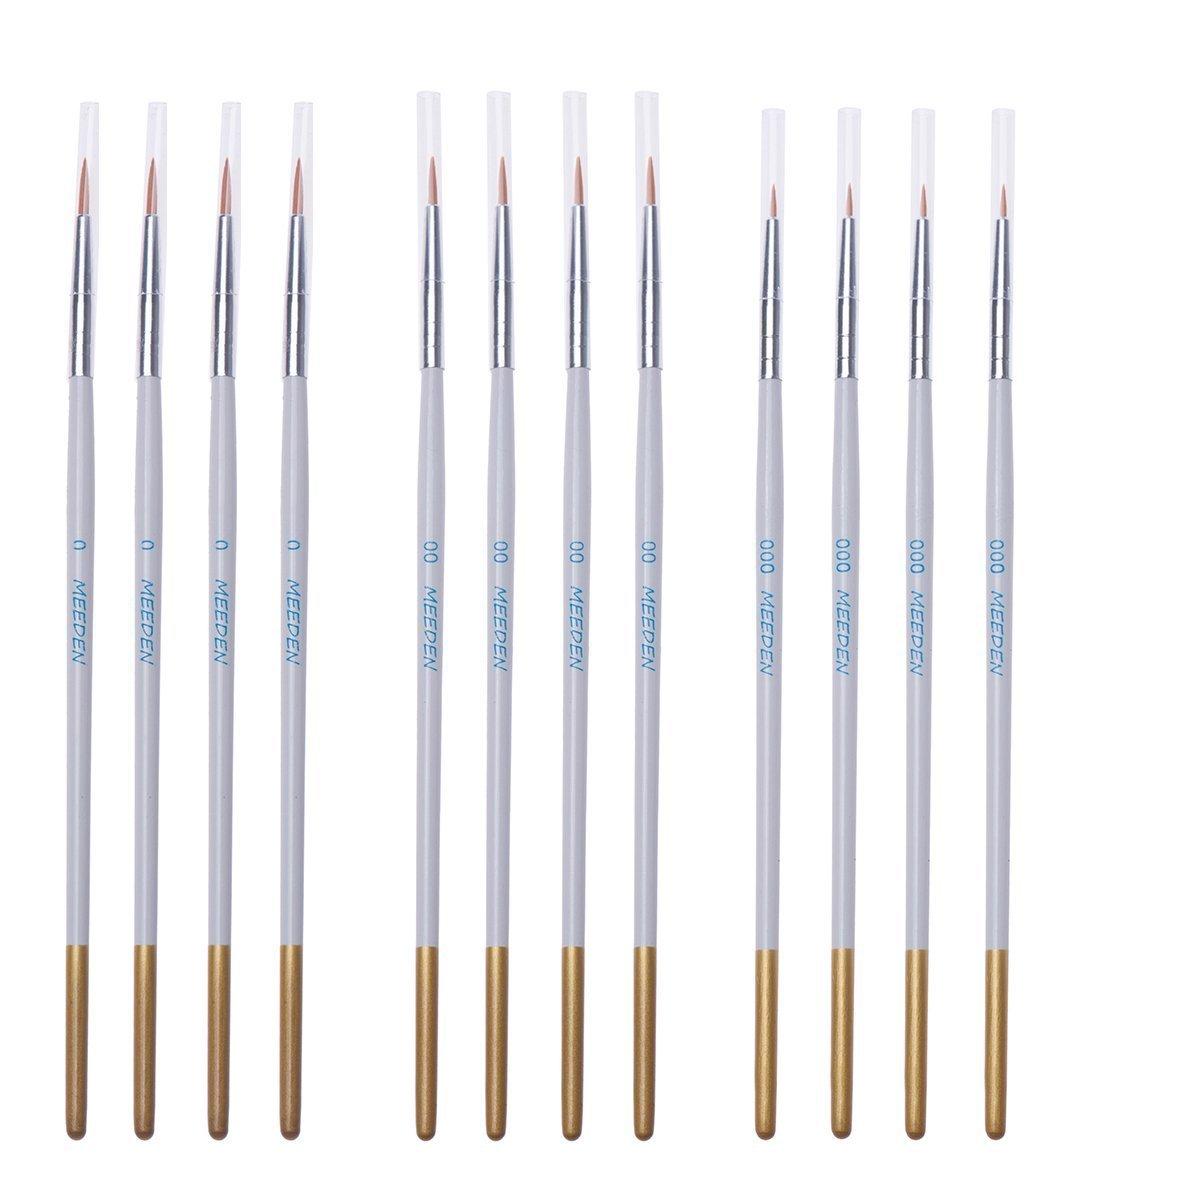 Nail Models Miniatures Watercolor Nylon Hair Acrylic Oil 6 Miniature Art Brushes for Fine Detailing /& Art Painting Airplane Kits MEEDEN Detail Paint Brush Set